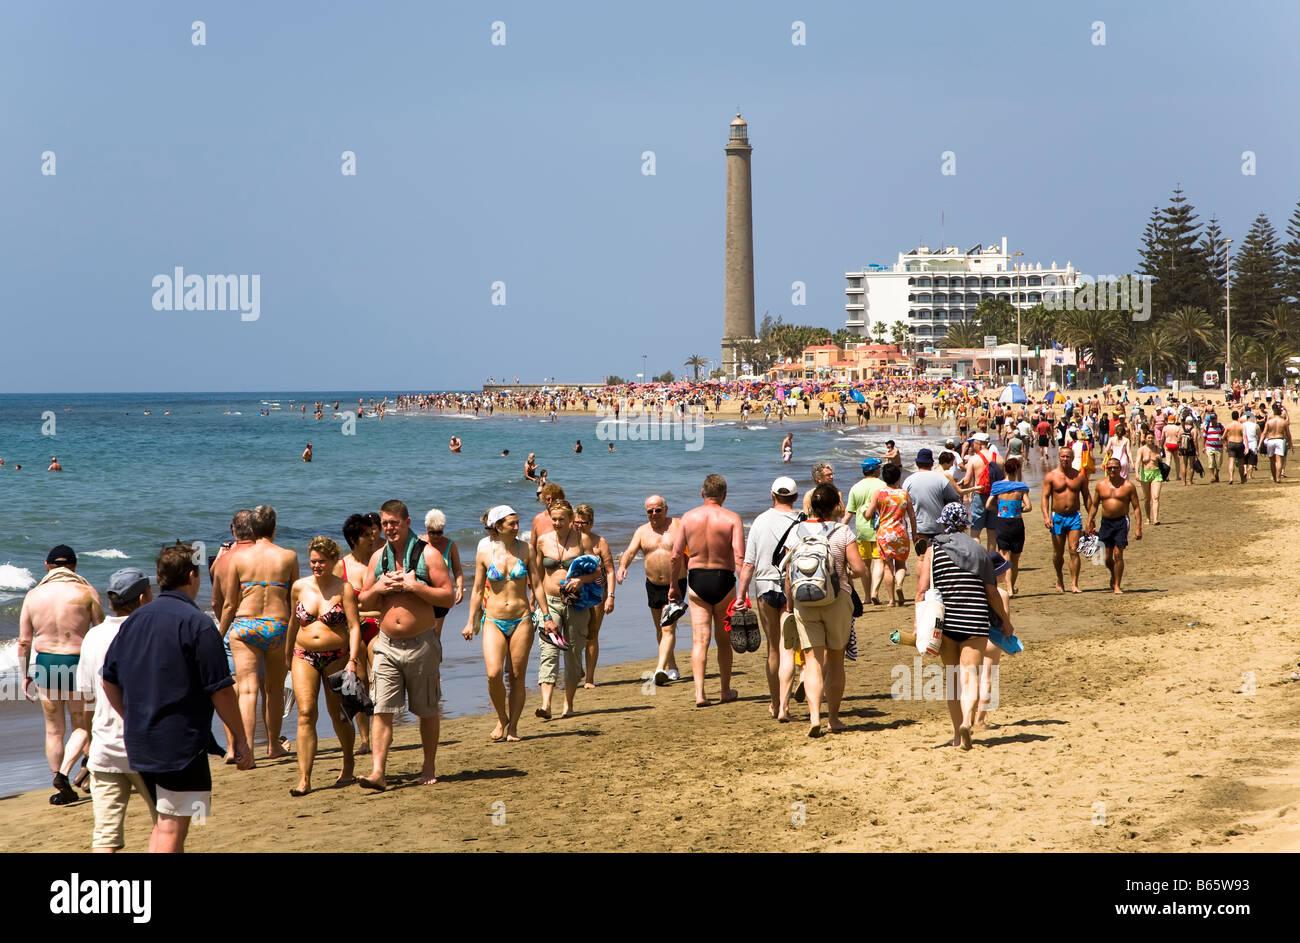 Crowds of tourists walking on beach Maspalomas Gran Canaria Spain - Stock Image